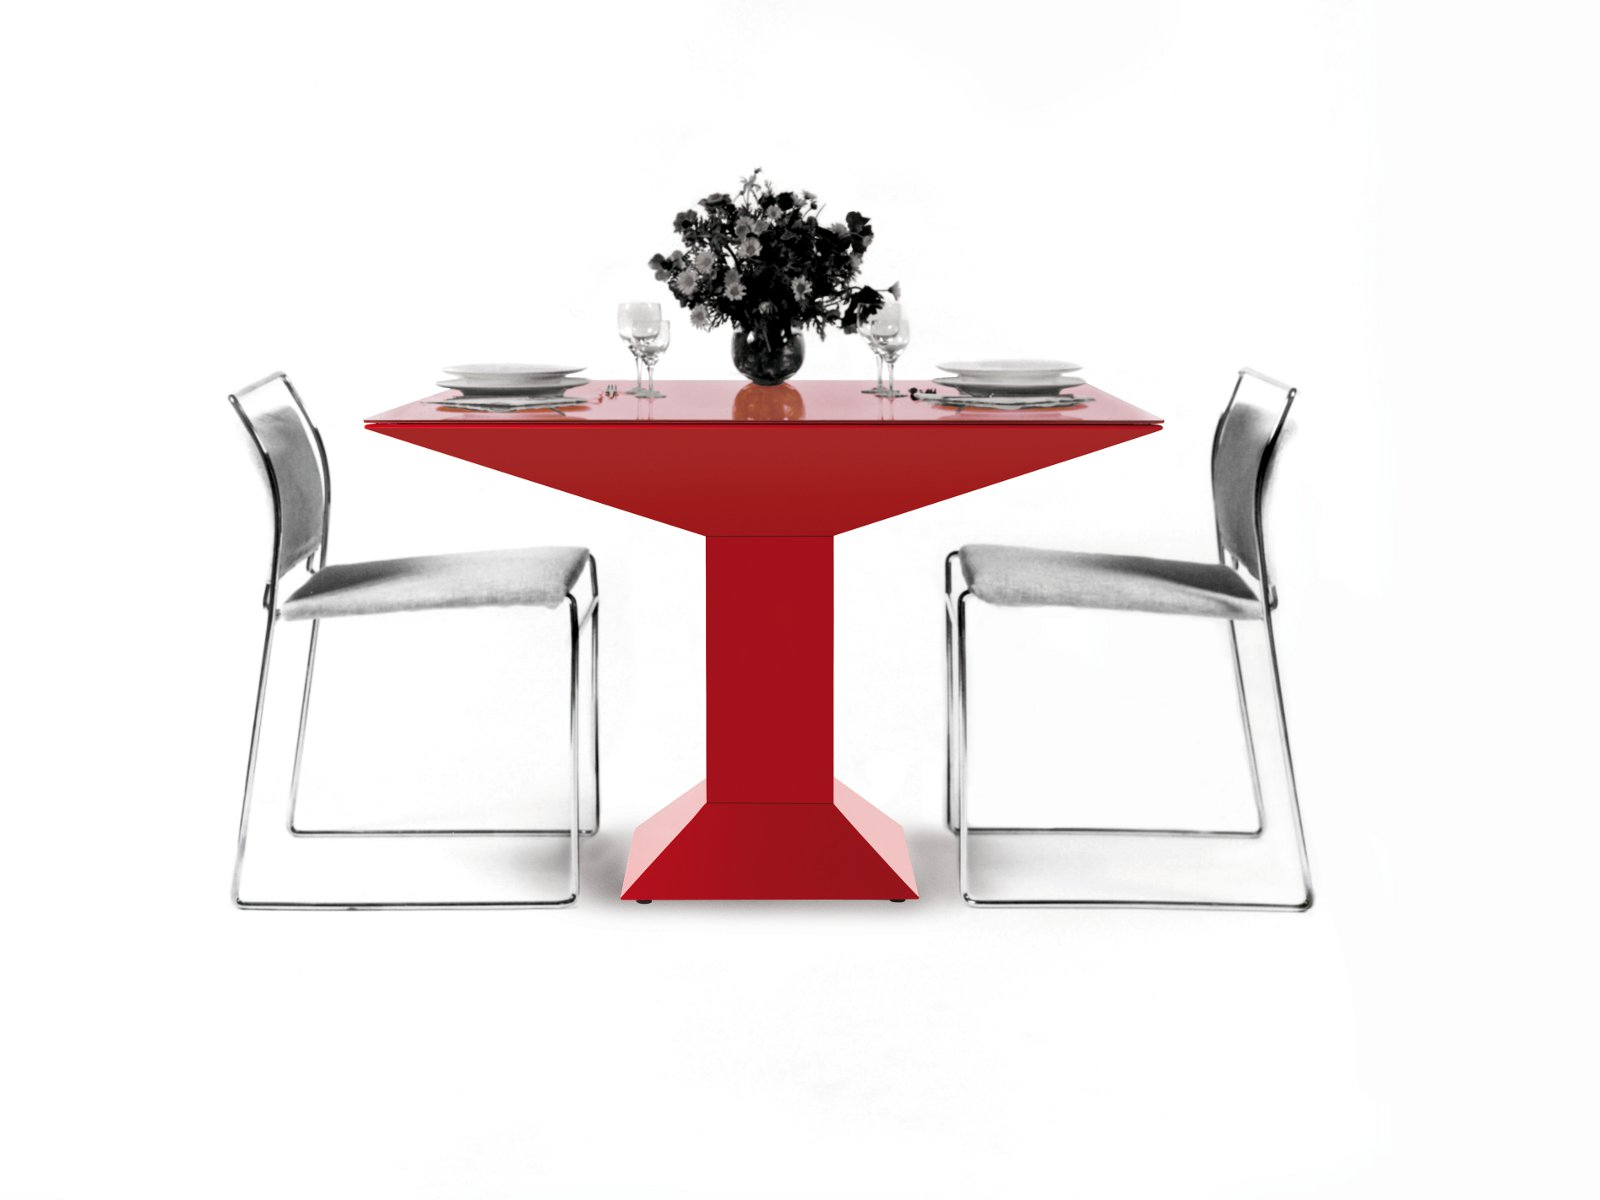 table carr e design mettsass by bd barcelona design design ettore sottsass jr. Black Bedroom Furniture Sets. Home Design Ideas